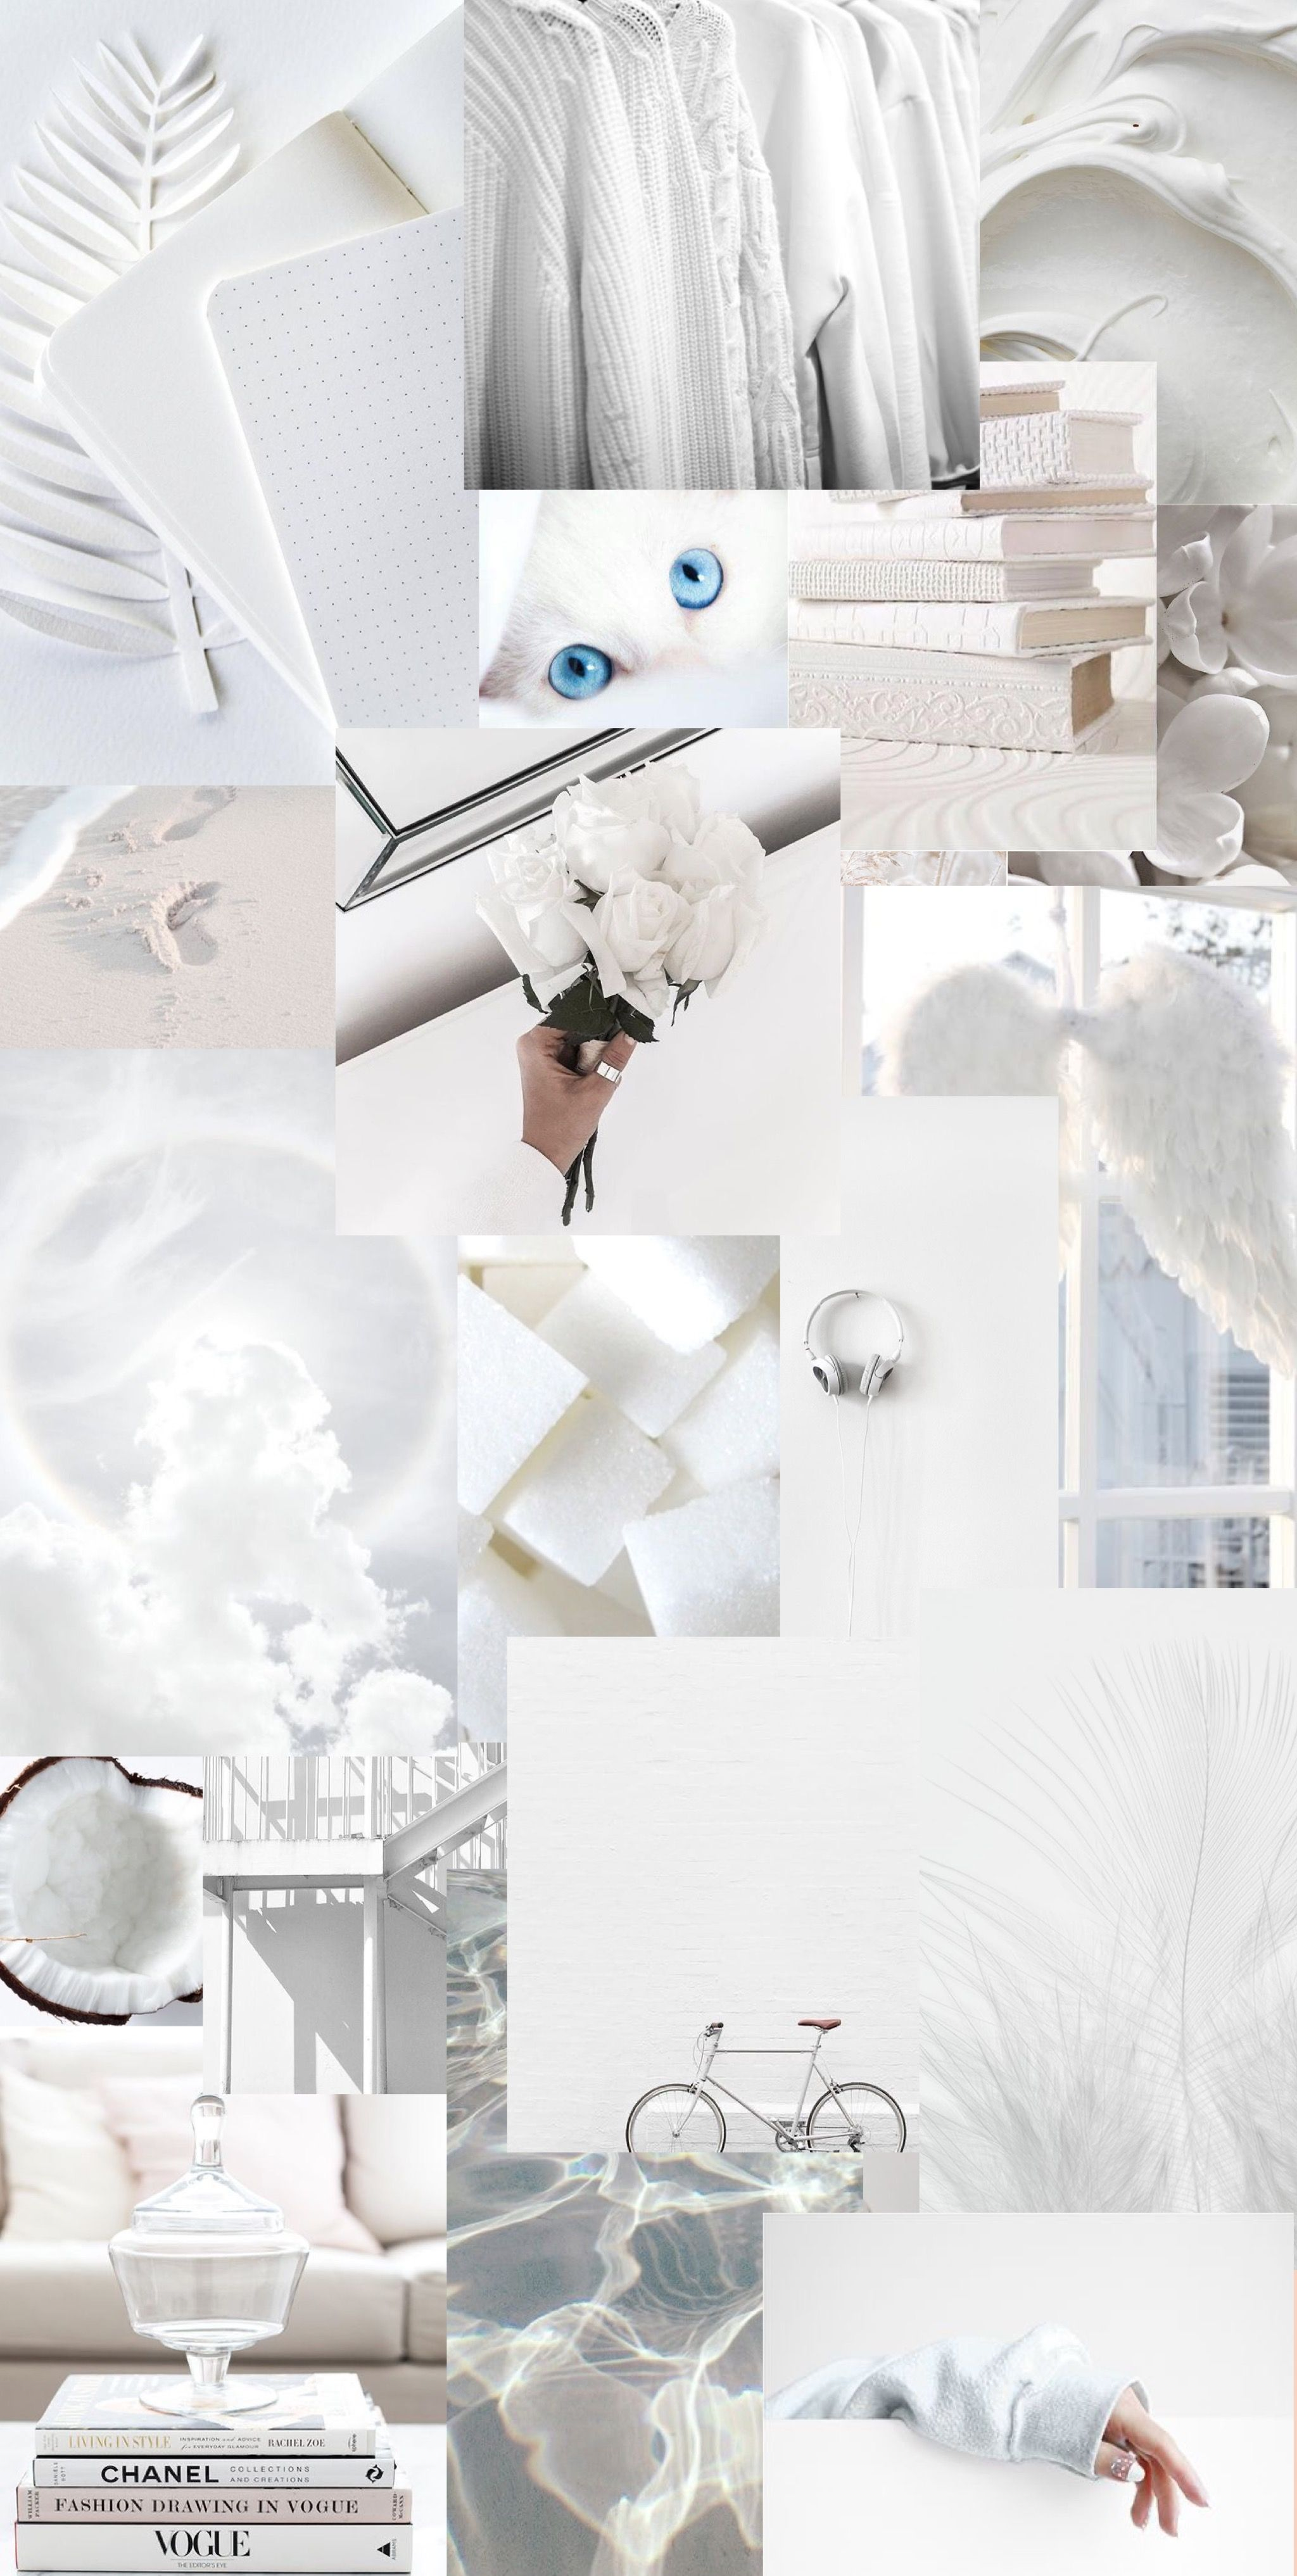 Fond D Ecran Aesthetic En 2020 Fond D Ecran Telephone Fond D Ecran Colore Fond Ecran Blanc